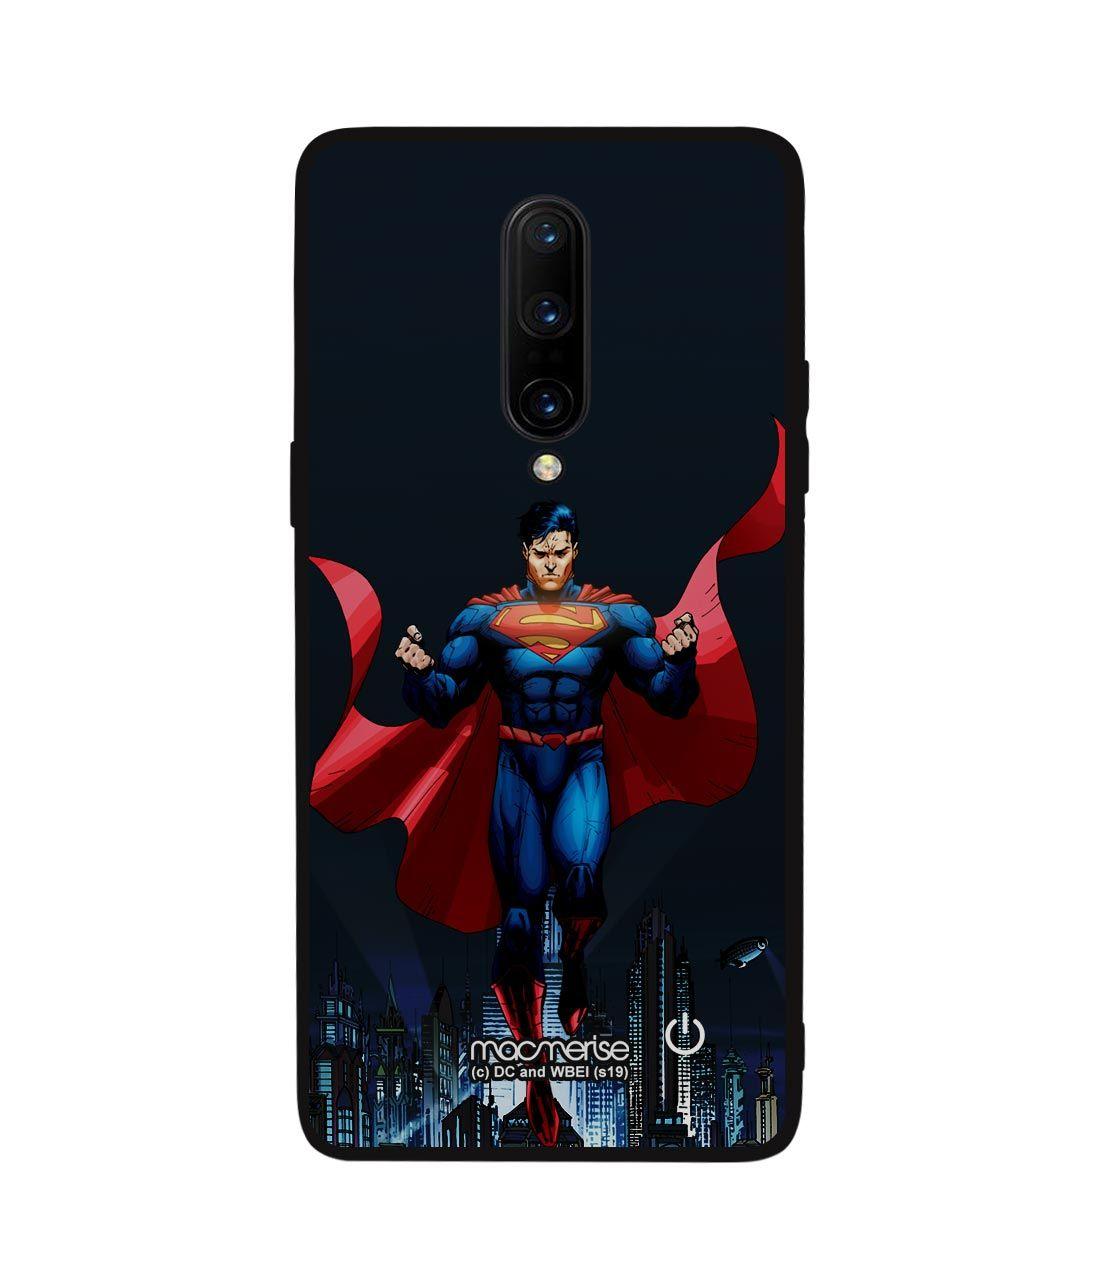 Metropolis Savior - Lumous LED Phone Case for OnePlus 8